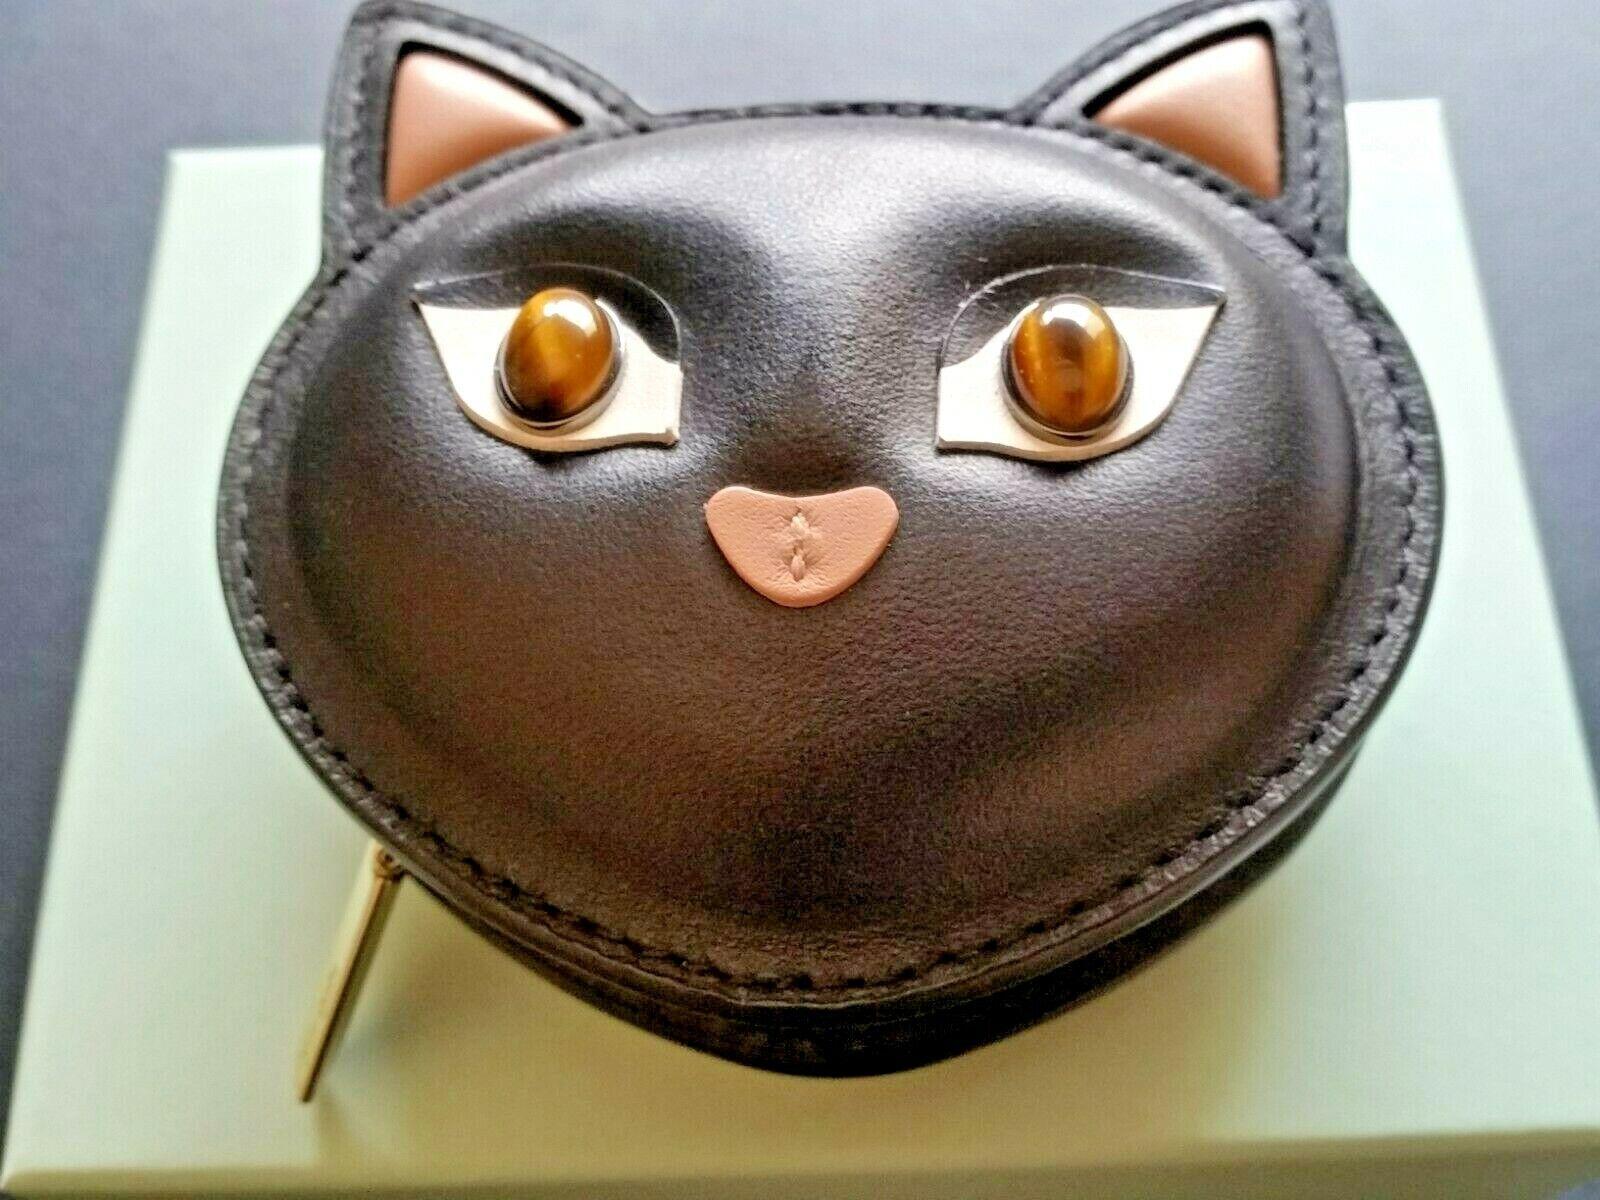 Kate Spade Meow Cat Coin Purse - Black